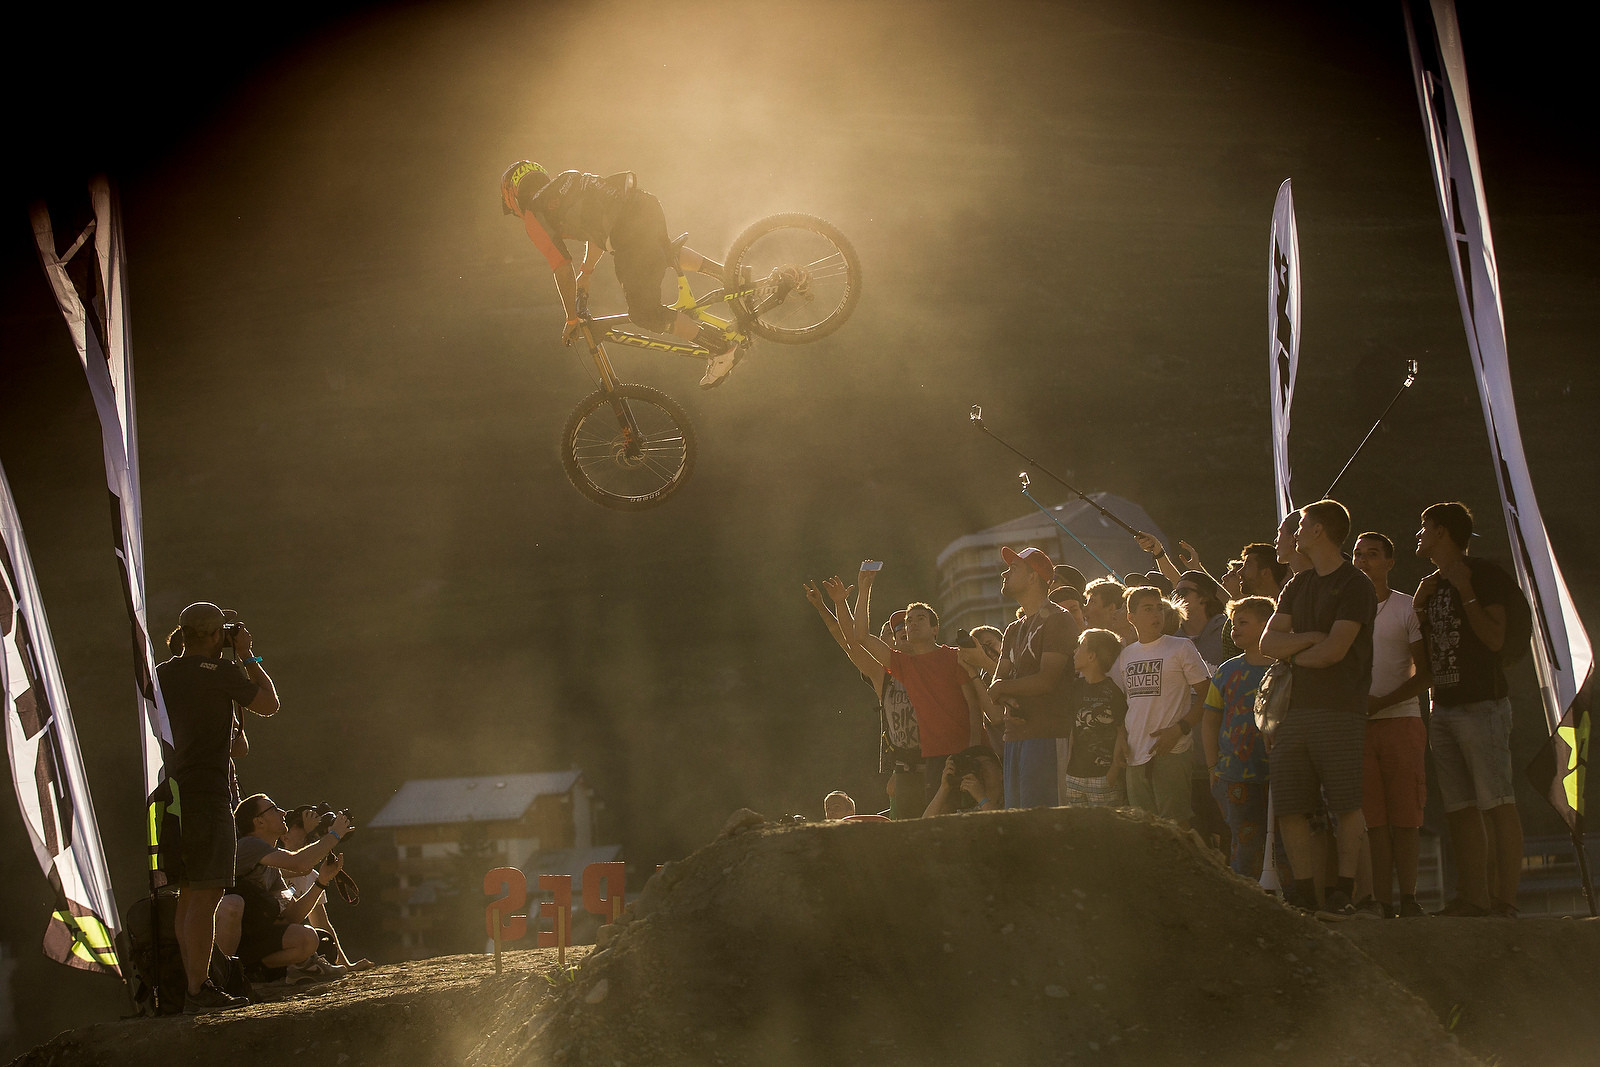 Sam Blenkinsop, Whip Off European Champs, Crankworx L2A - Whip Off European Champs, Crankworx L2A - Mountain Biking Pictures - Vital MTB